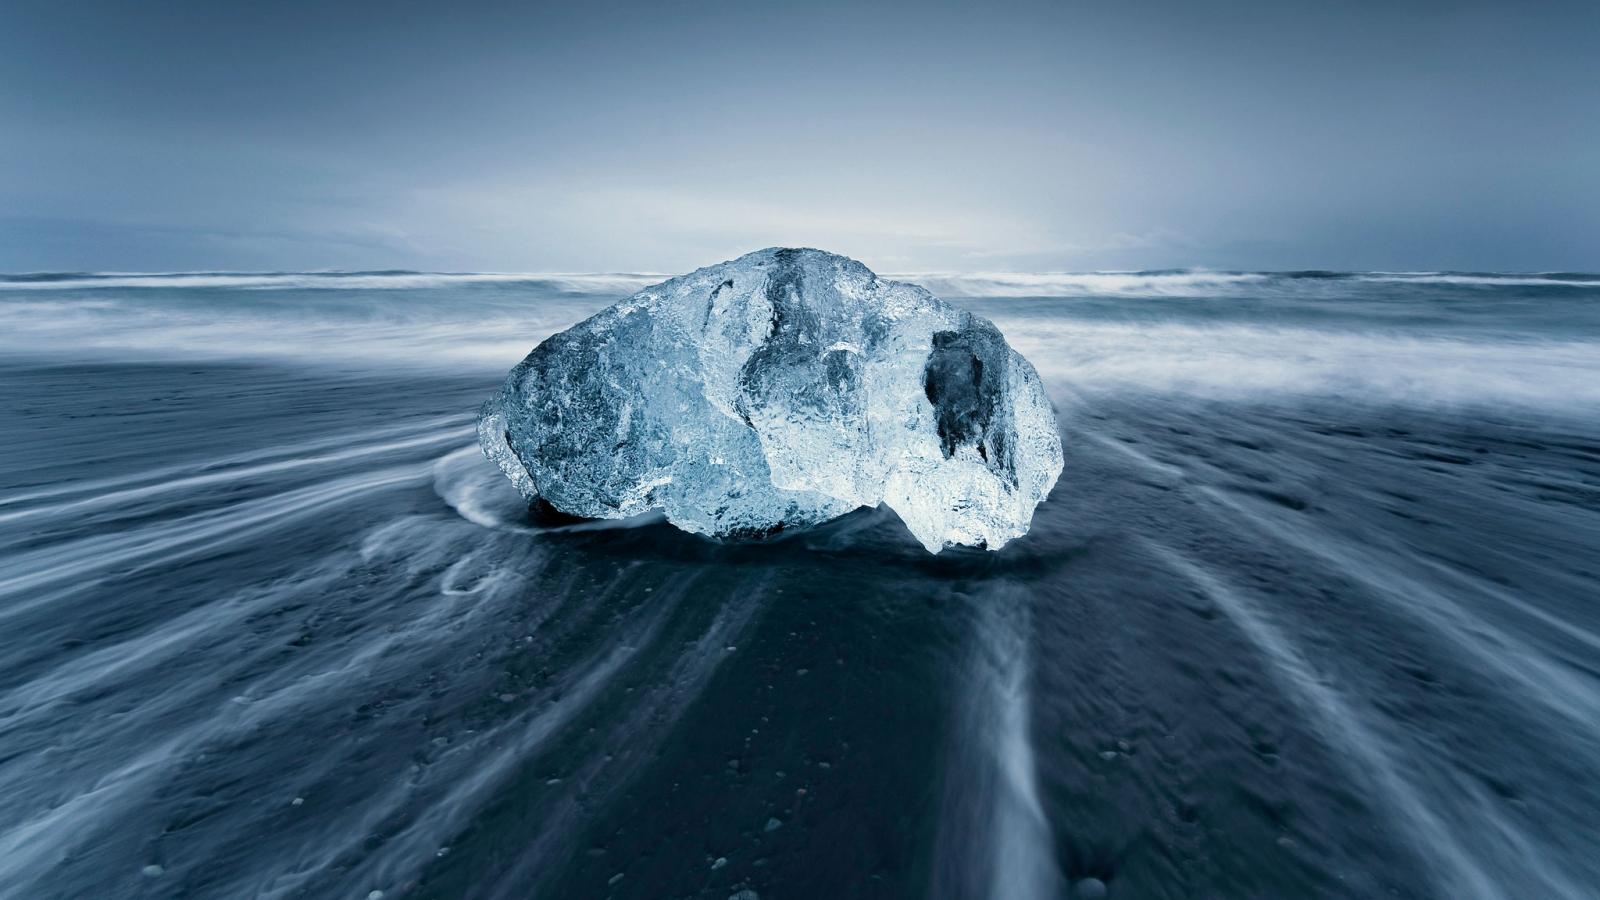 Una gran roca en la playa - 1600x900